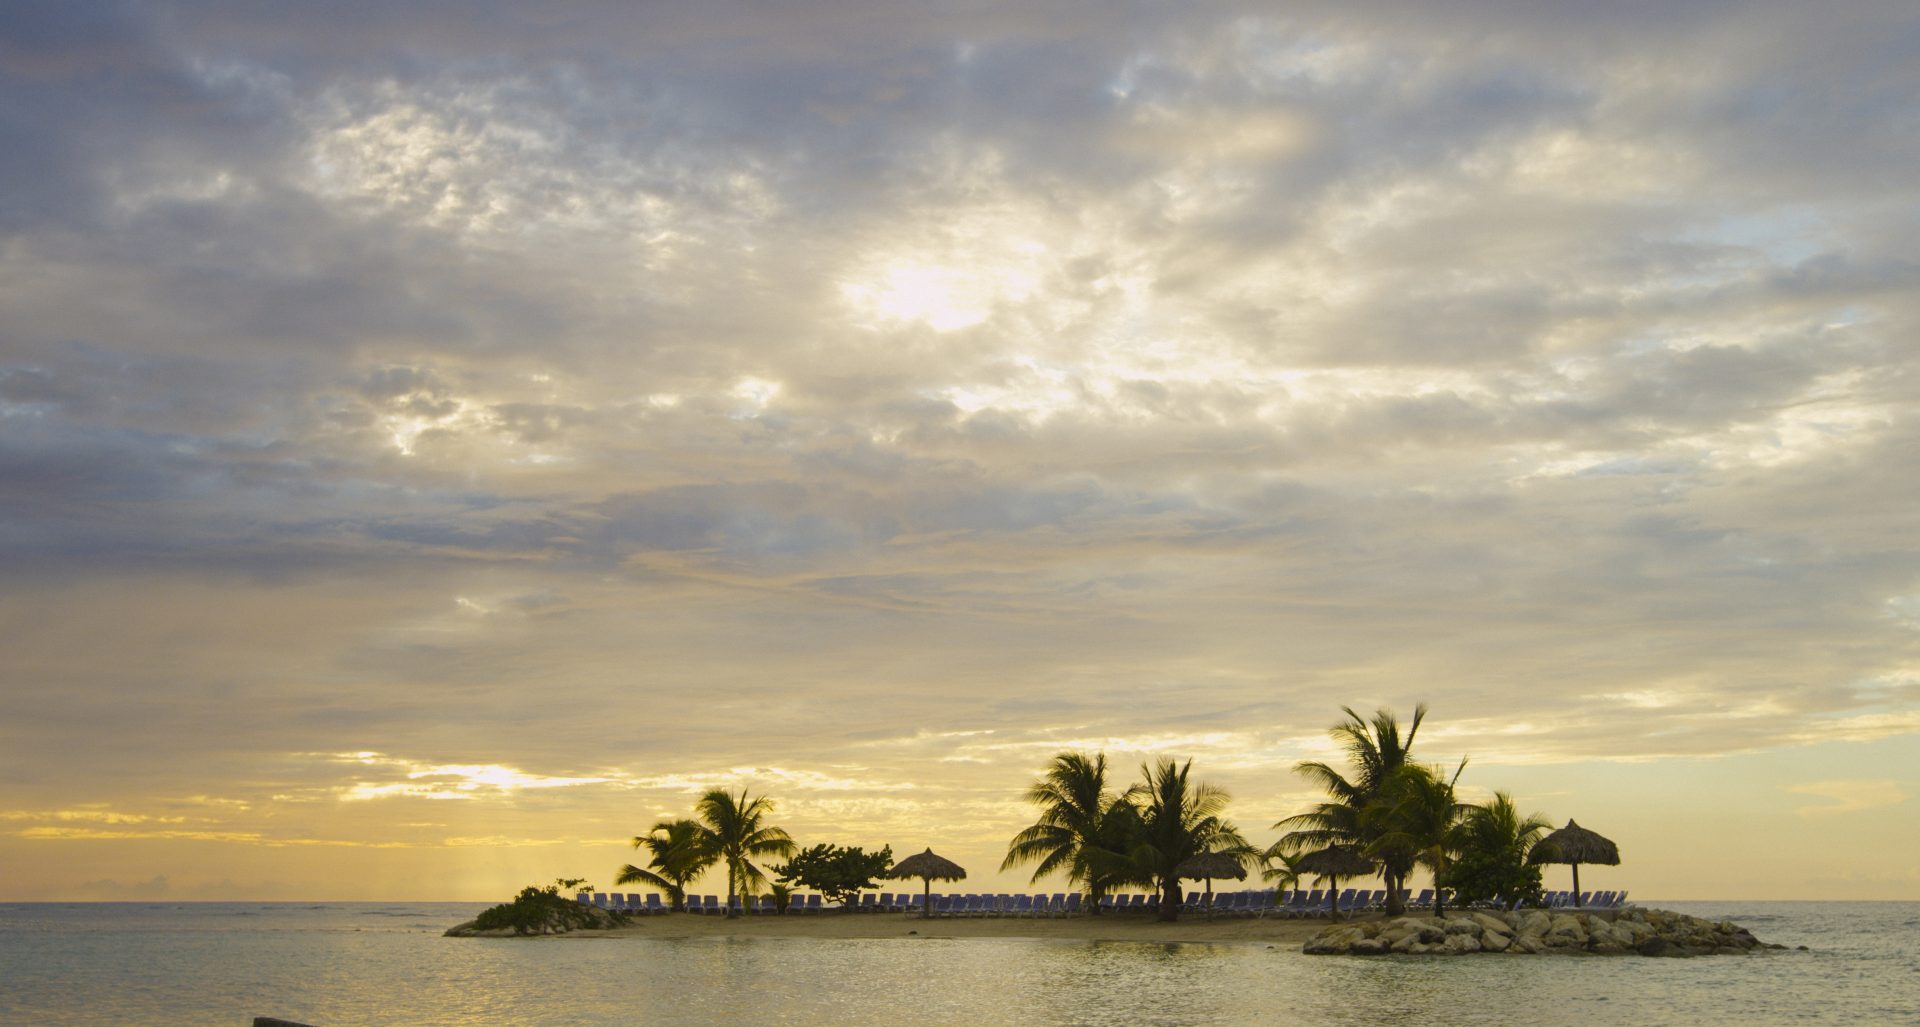 beach weddings, beach wedding venues in the Caribbean, best wedding venues in Mexico, outdoor wedding venues , mexico destination wedding, beach wedding packages